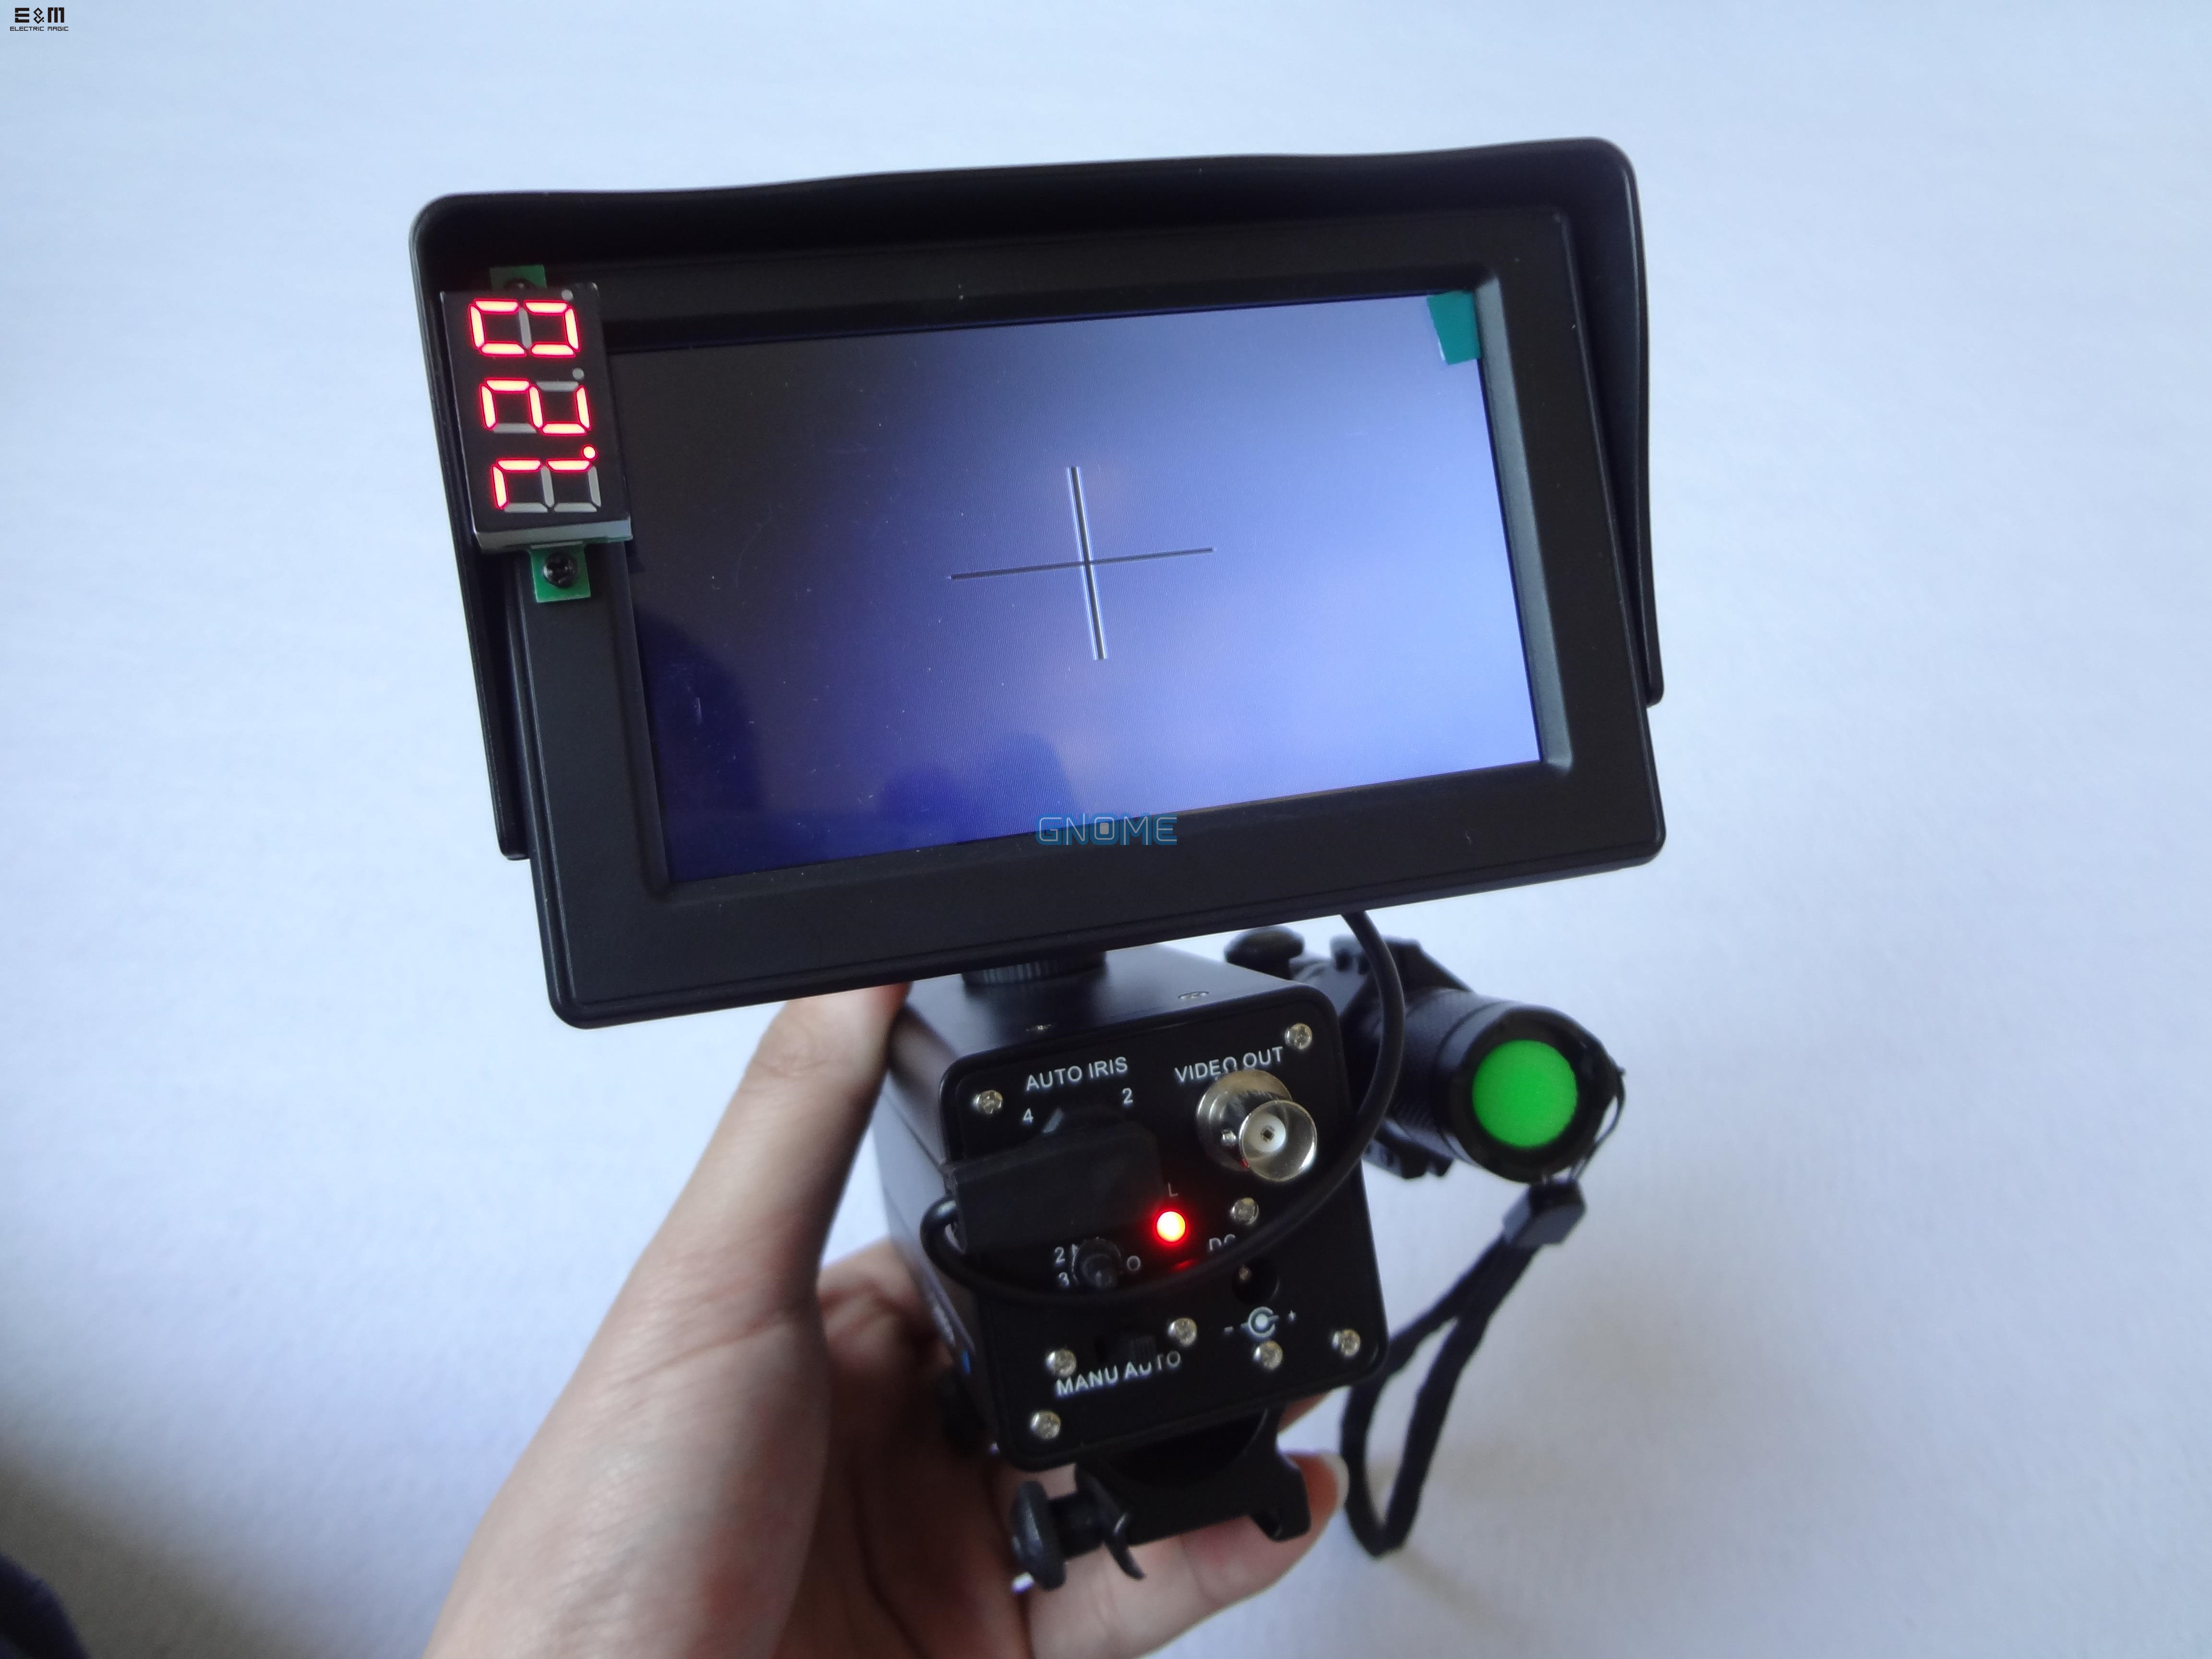 E&M DIY Portable Hand Held Night Vision Riflescope Sight Monocular Hunting With Goggles Scope Hunter NVR Rifle Film Head Display